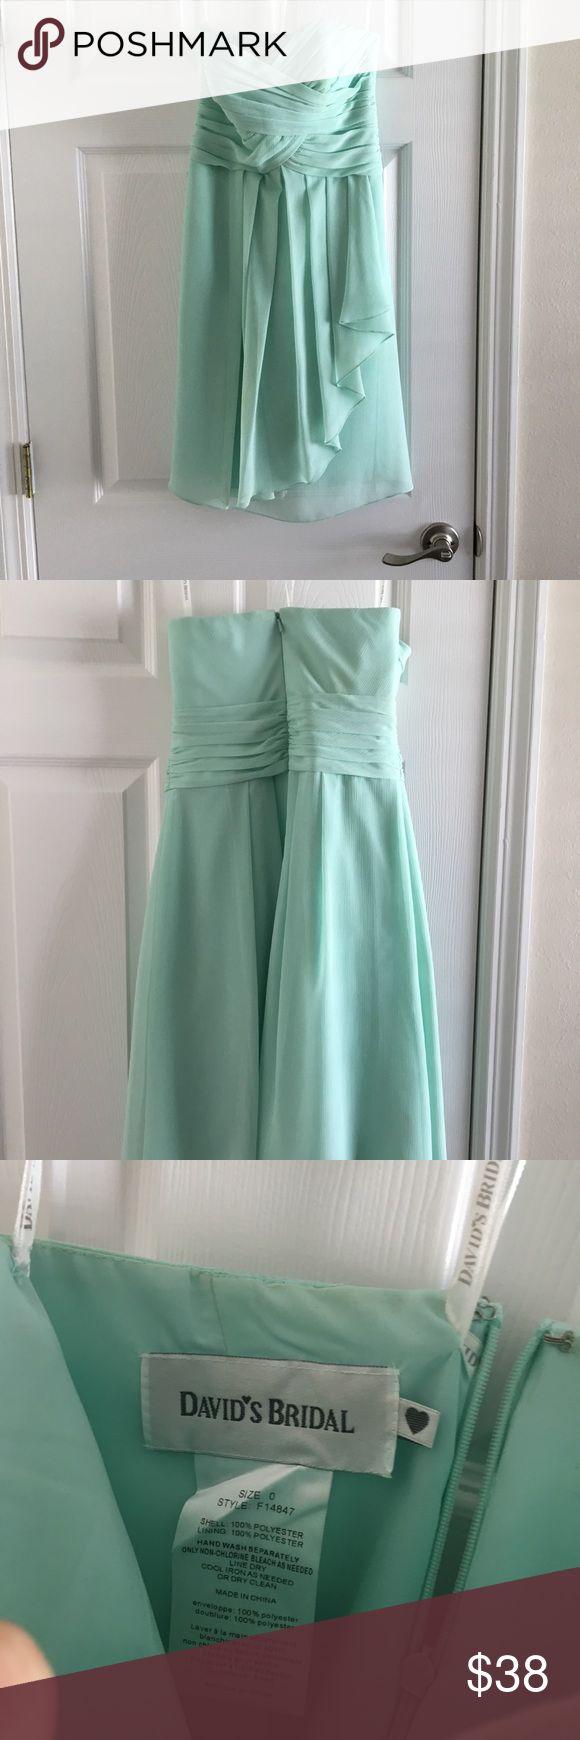 David's Bridal Mint Bridesmaid Dress Strapless, short mint colored bridesmaid dress. No alterations. Worn once. Like new. David's Bridal Dresses Wedding